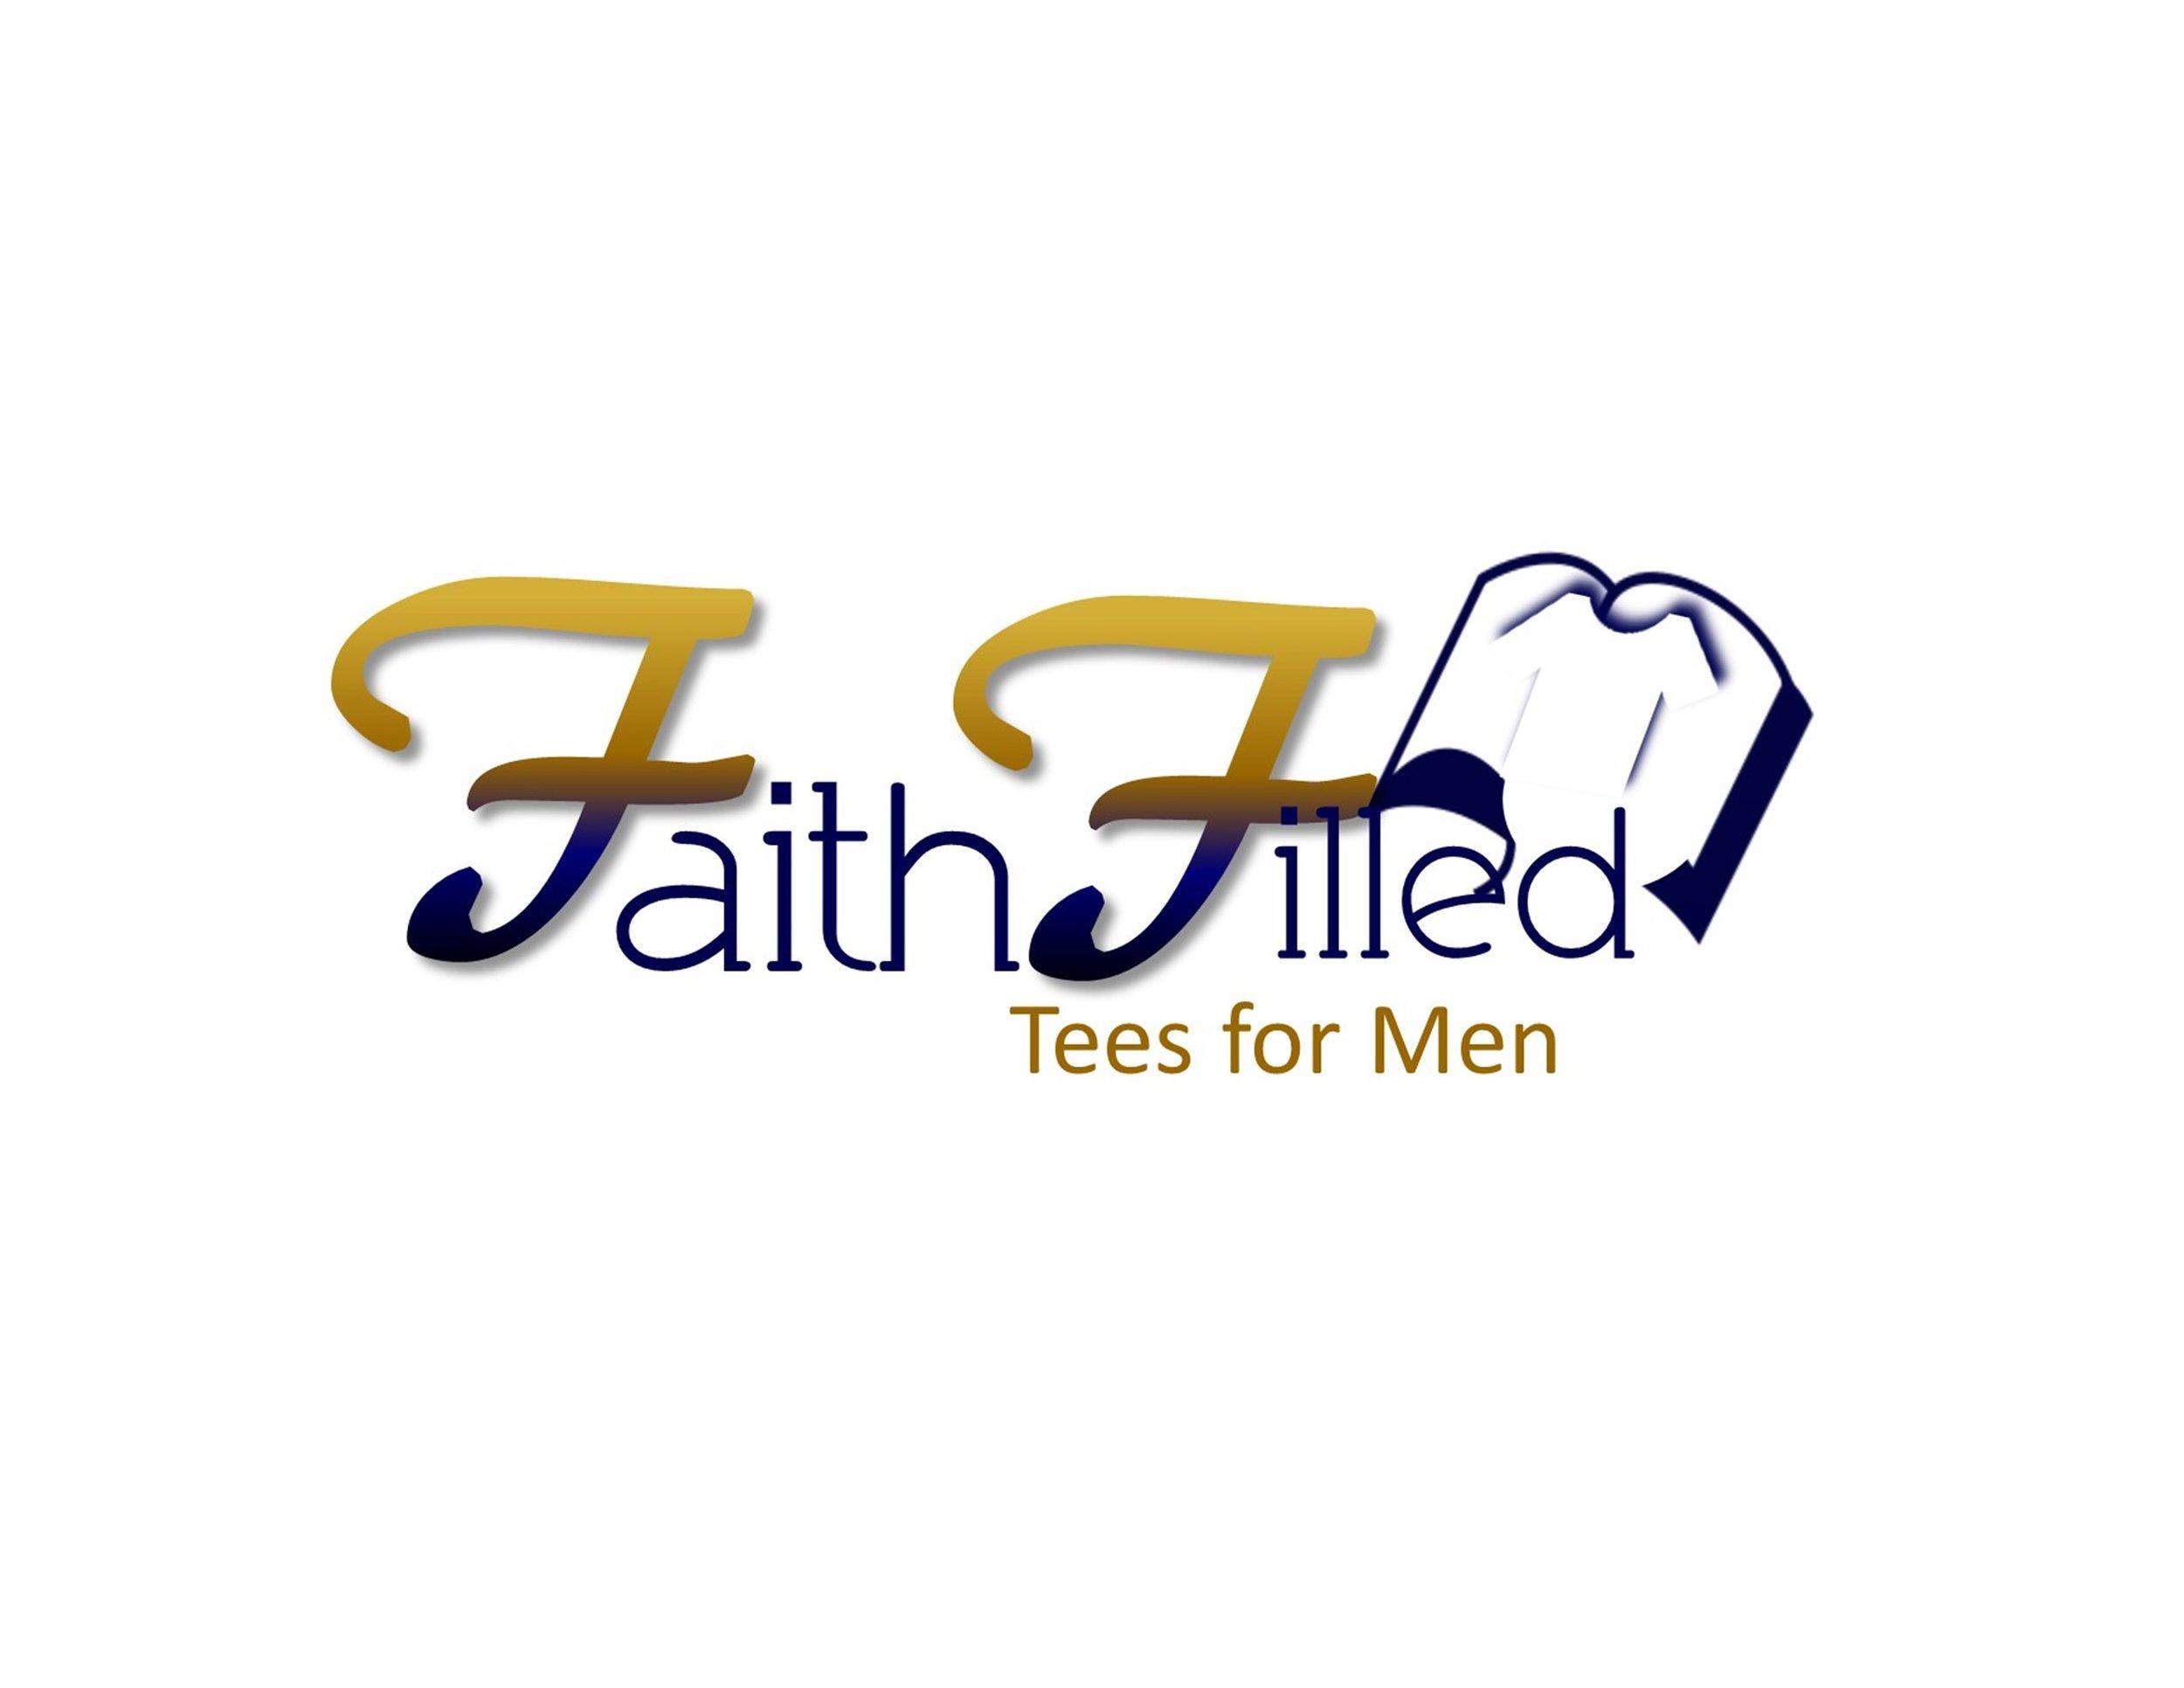 FAITHFILLED TFM FINAL LOGO.jpg